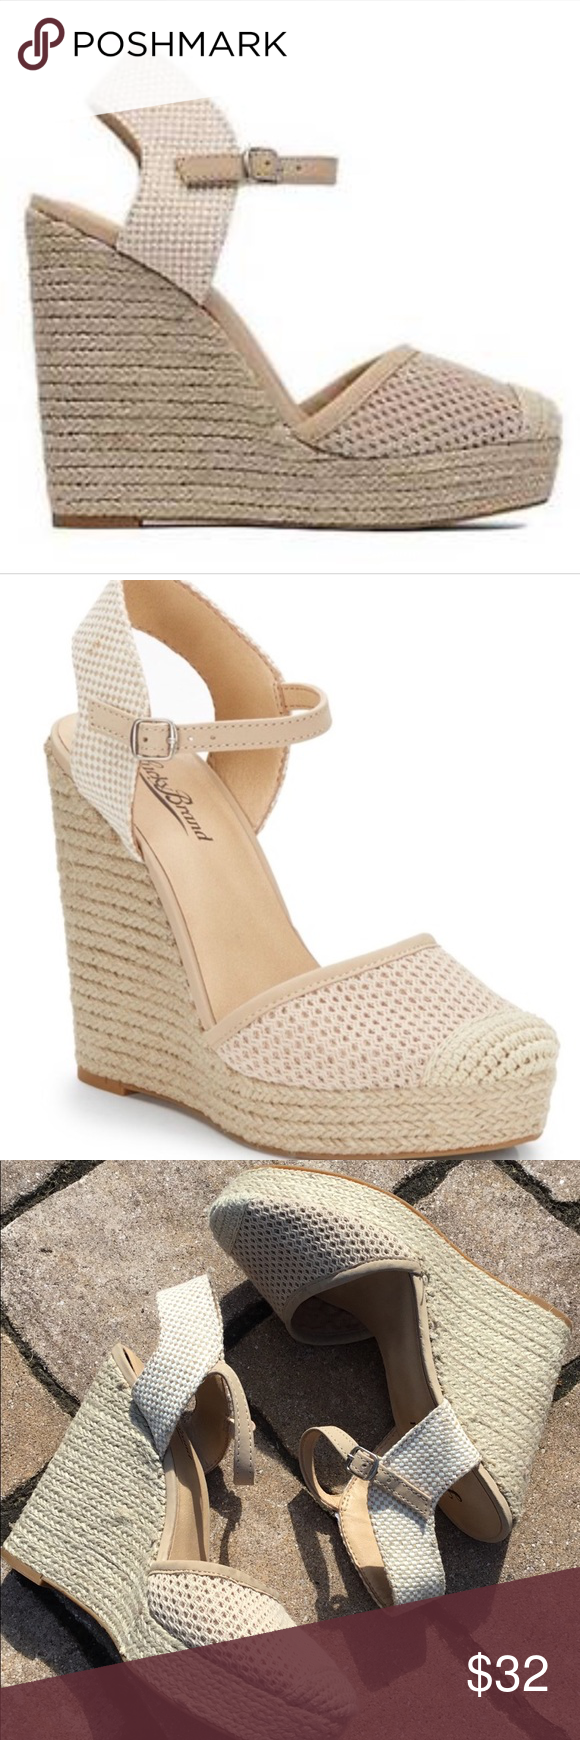 6c2e0e6a20d Lucky Brand Reandra Wedge Espadrille Sandals